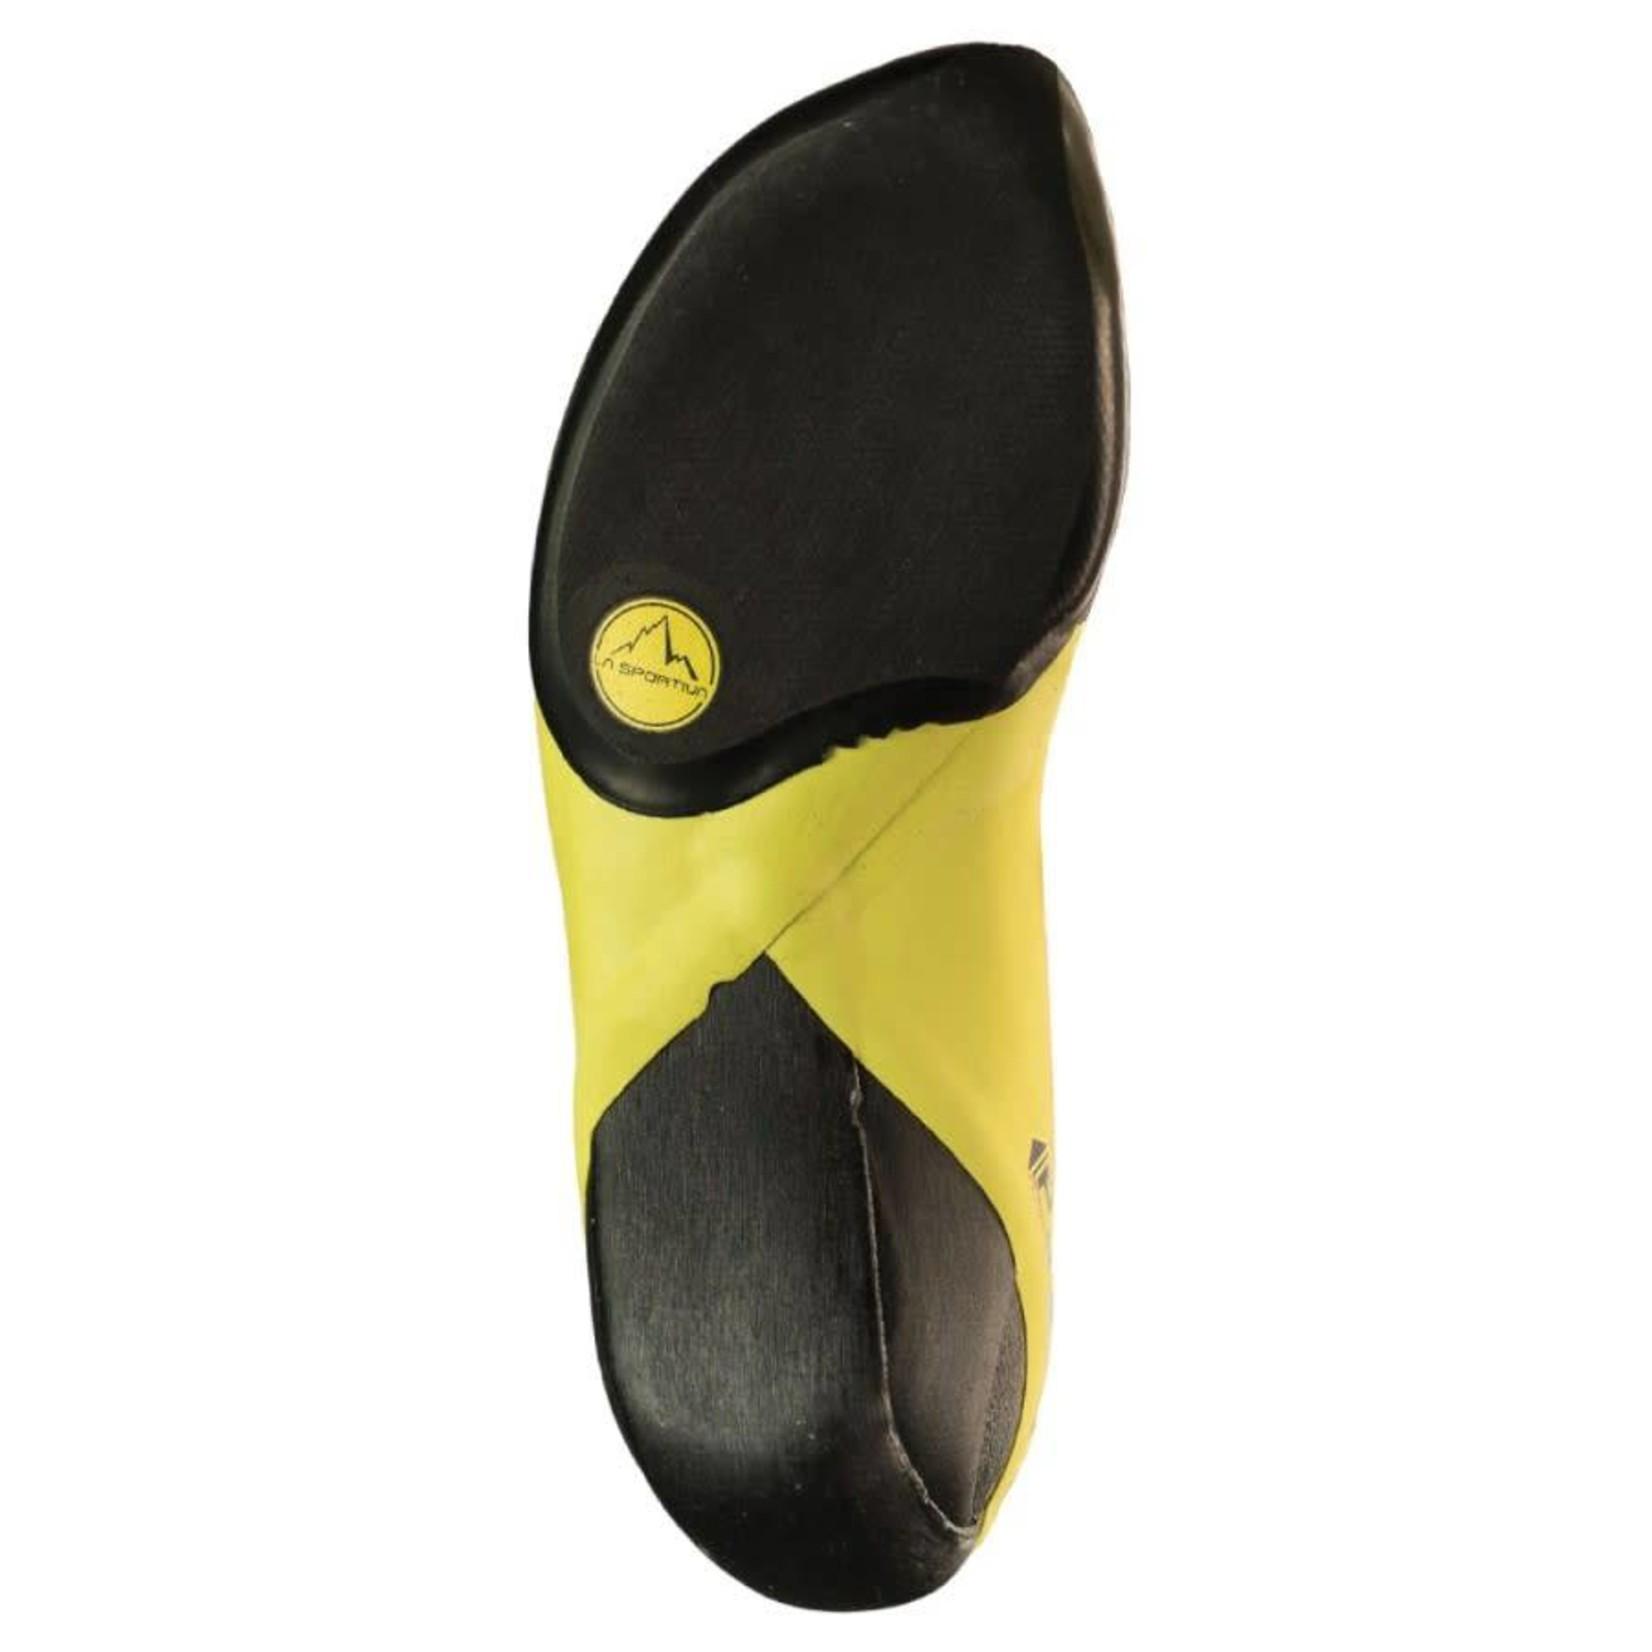 La Sportiva La Sportiva Maverink Climbing Shoes - Youth